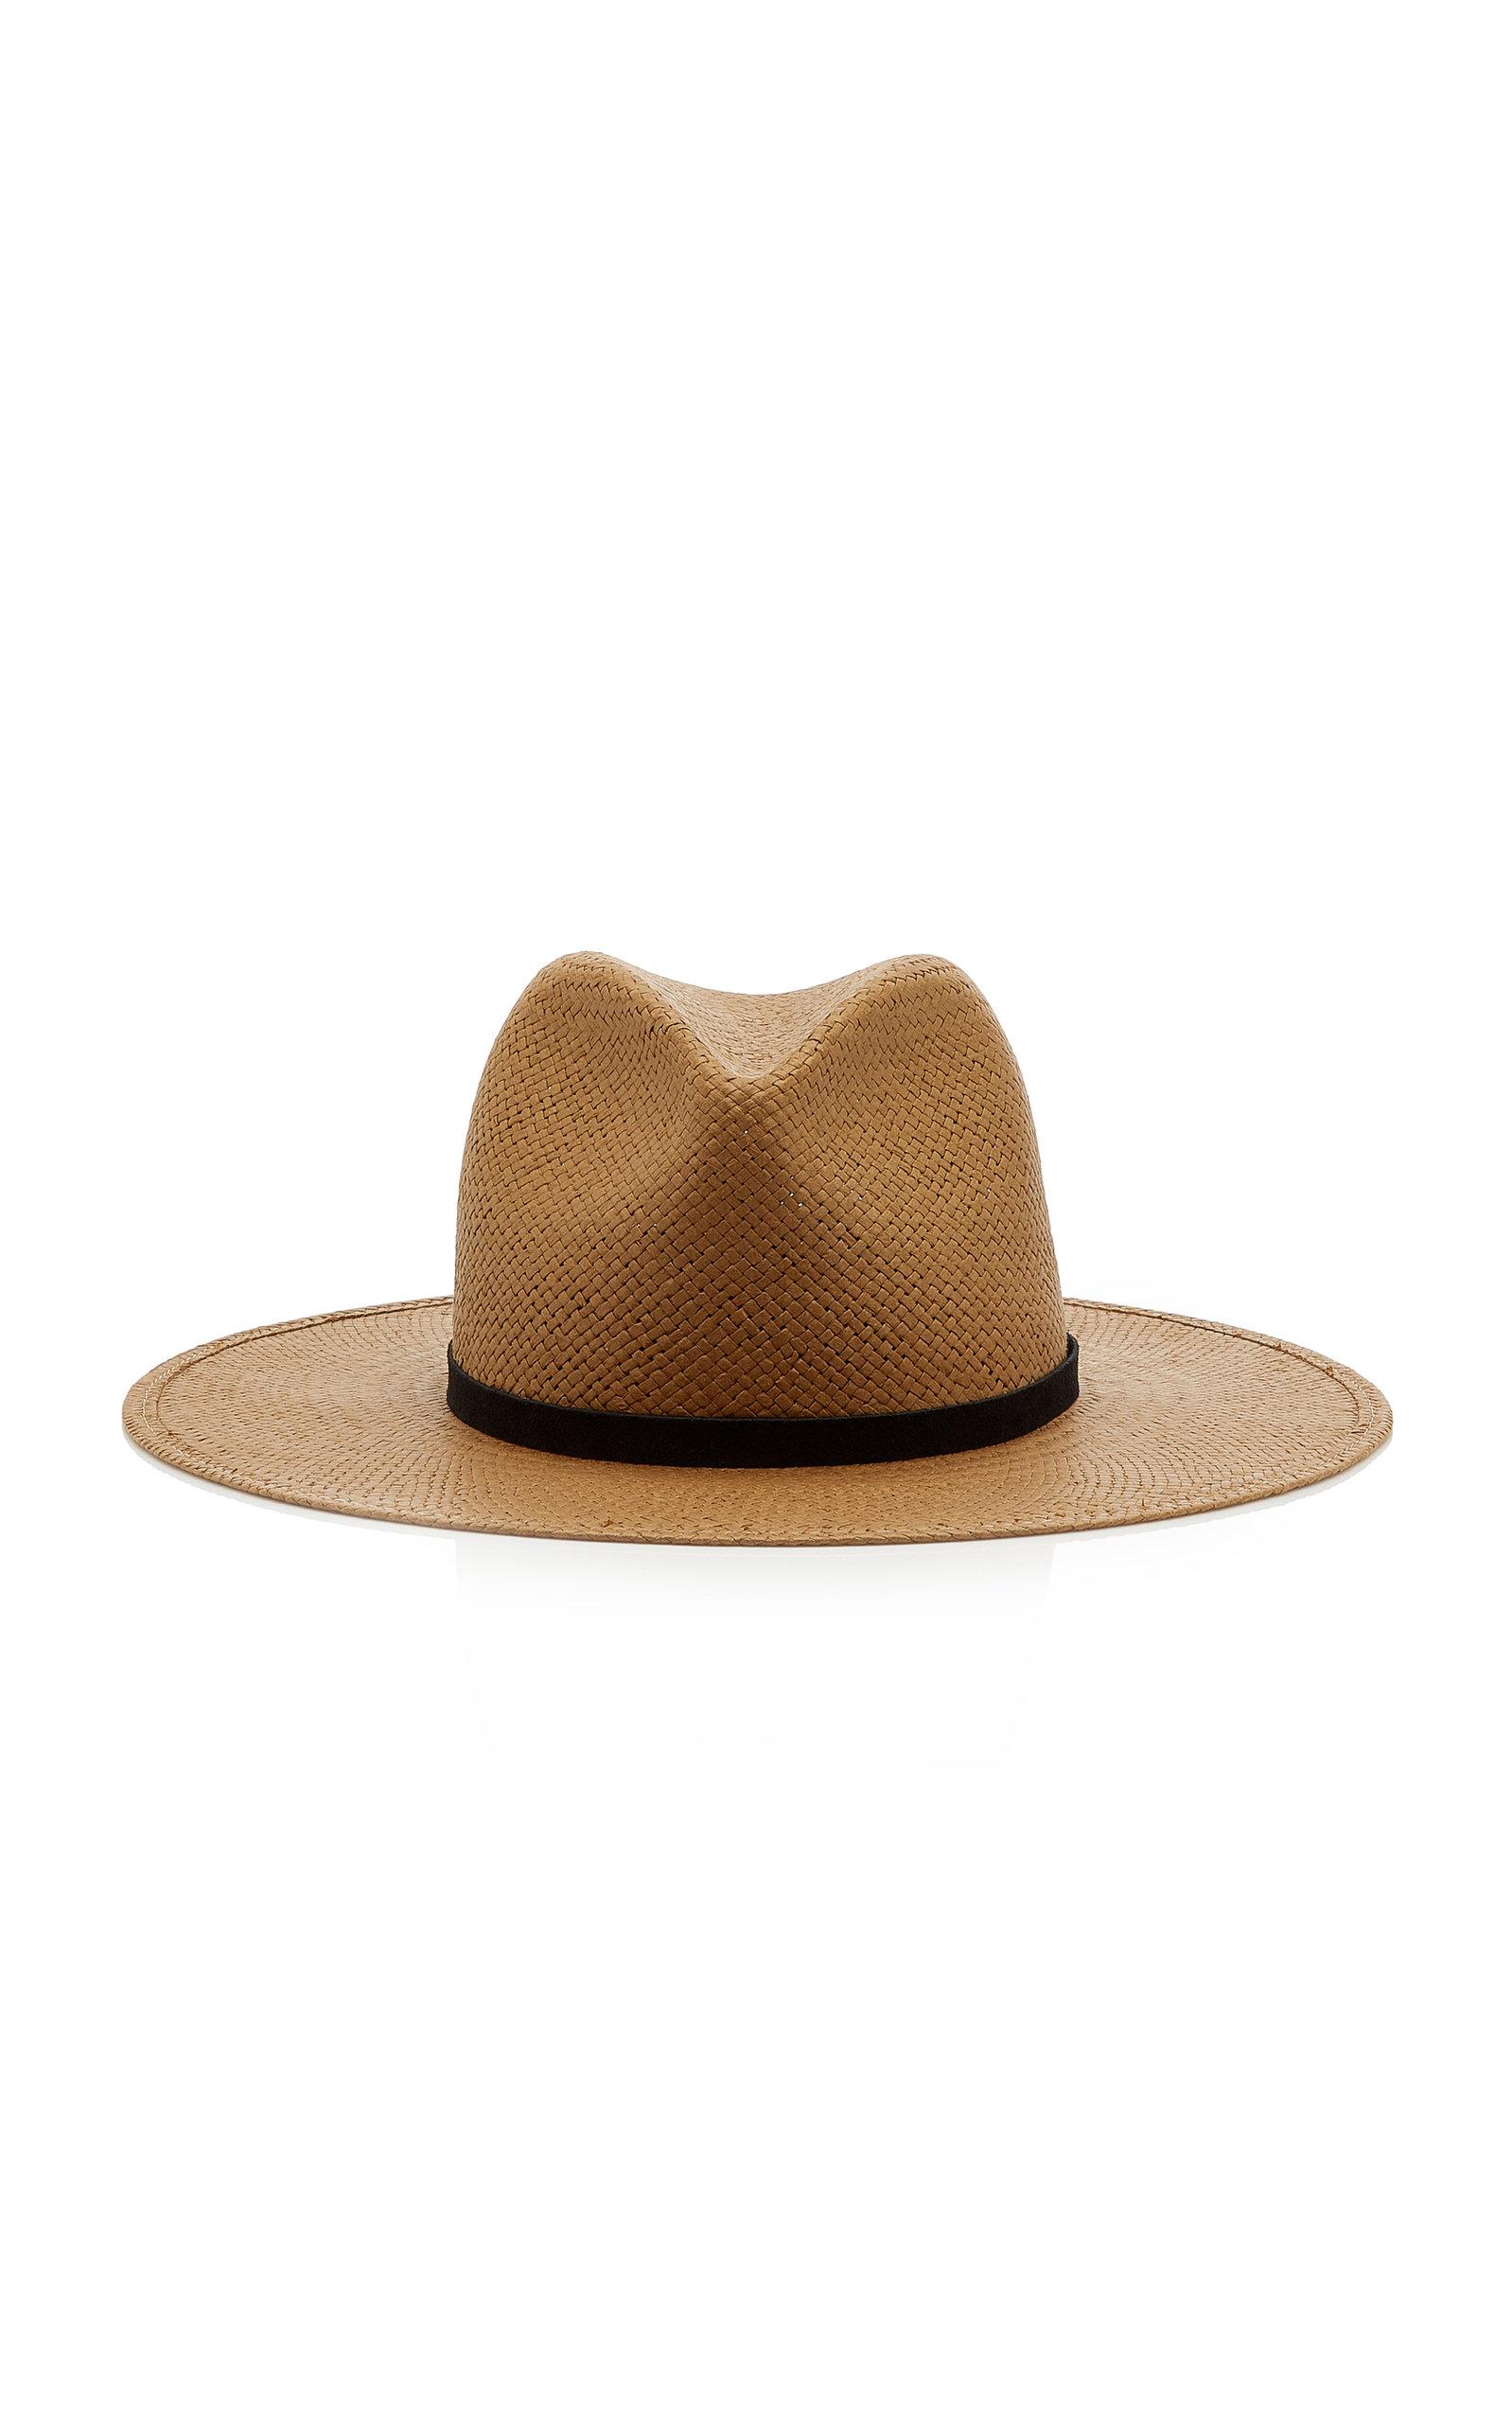 Women's Hollis Packable Straw Hat